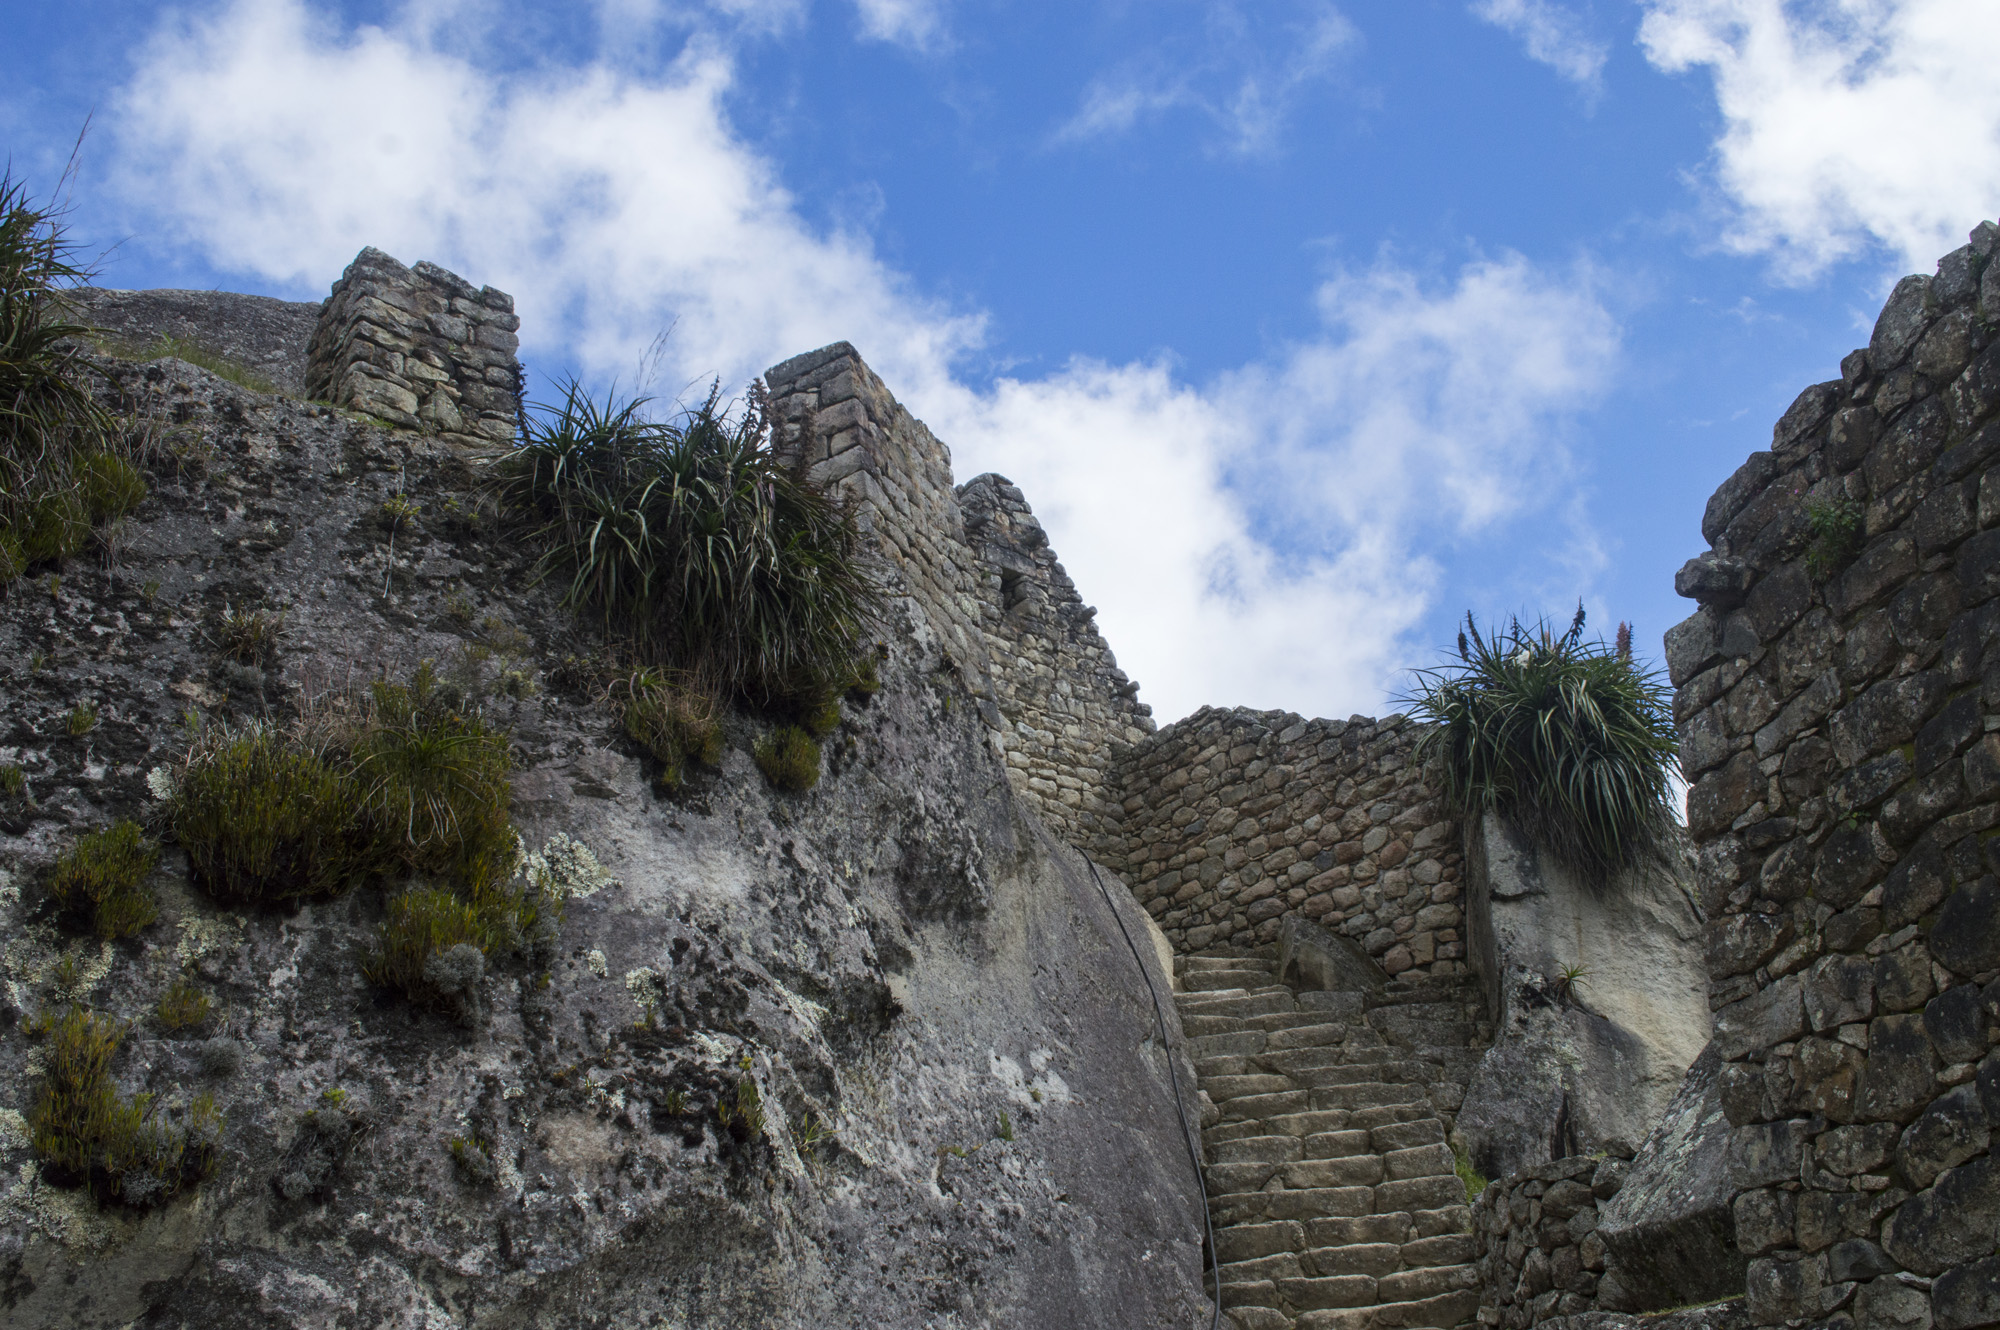 Inca 5 MP walls and sky.jpg